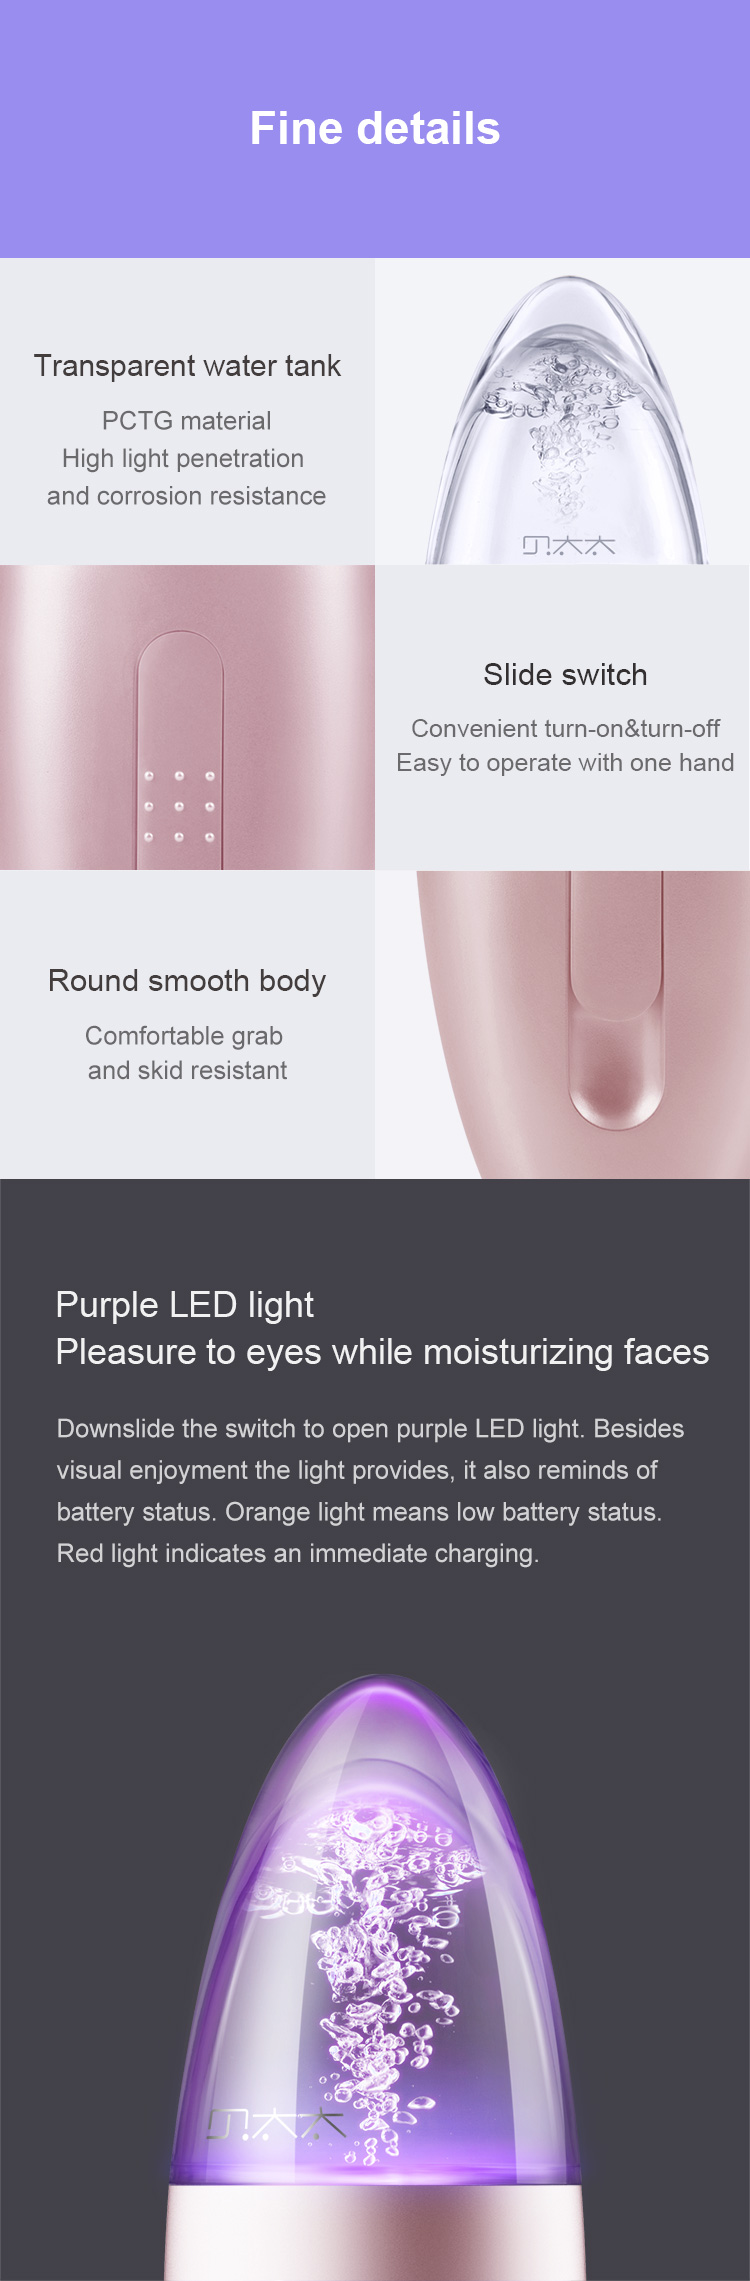 DR.BEI LADY BEI Ultrasonic Facial Moisturizing Sprayer Xiaomi Youpin DR·BEI Mist Facial Sprayer Portable USB Rechargeable Humidifier Nebulizer Steamer Moisturizing Face Skin Care Spray Instrument